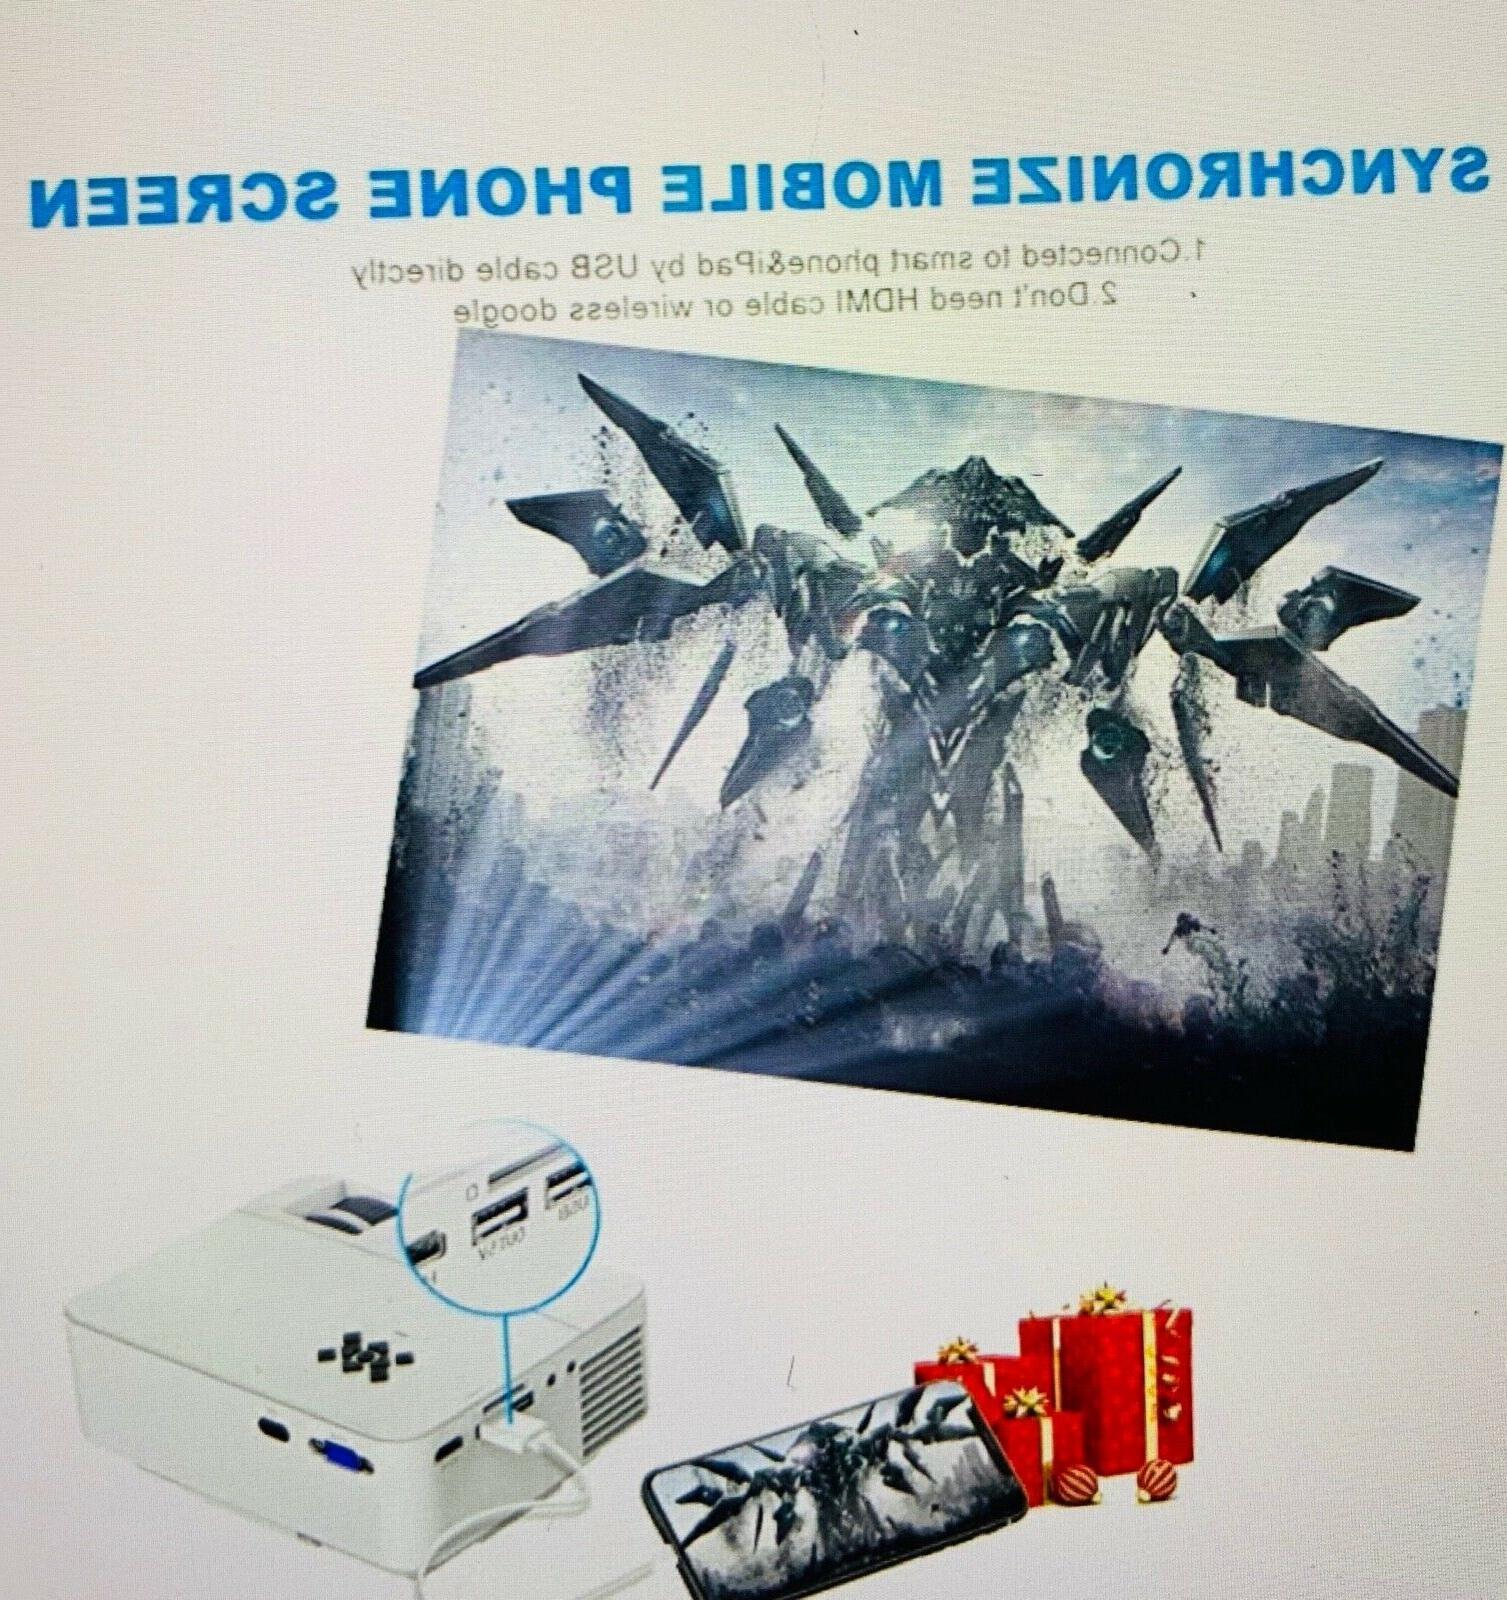 Mini 2400Lux Projector Synchronize